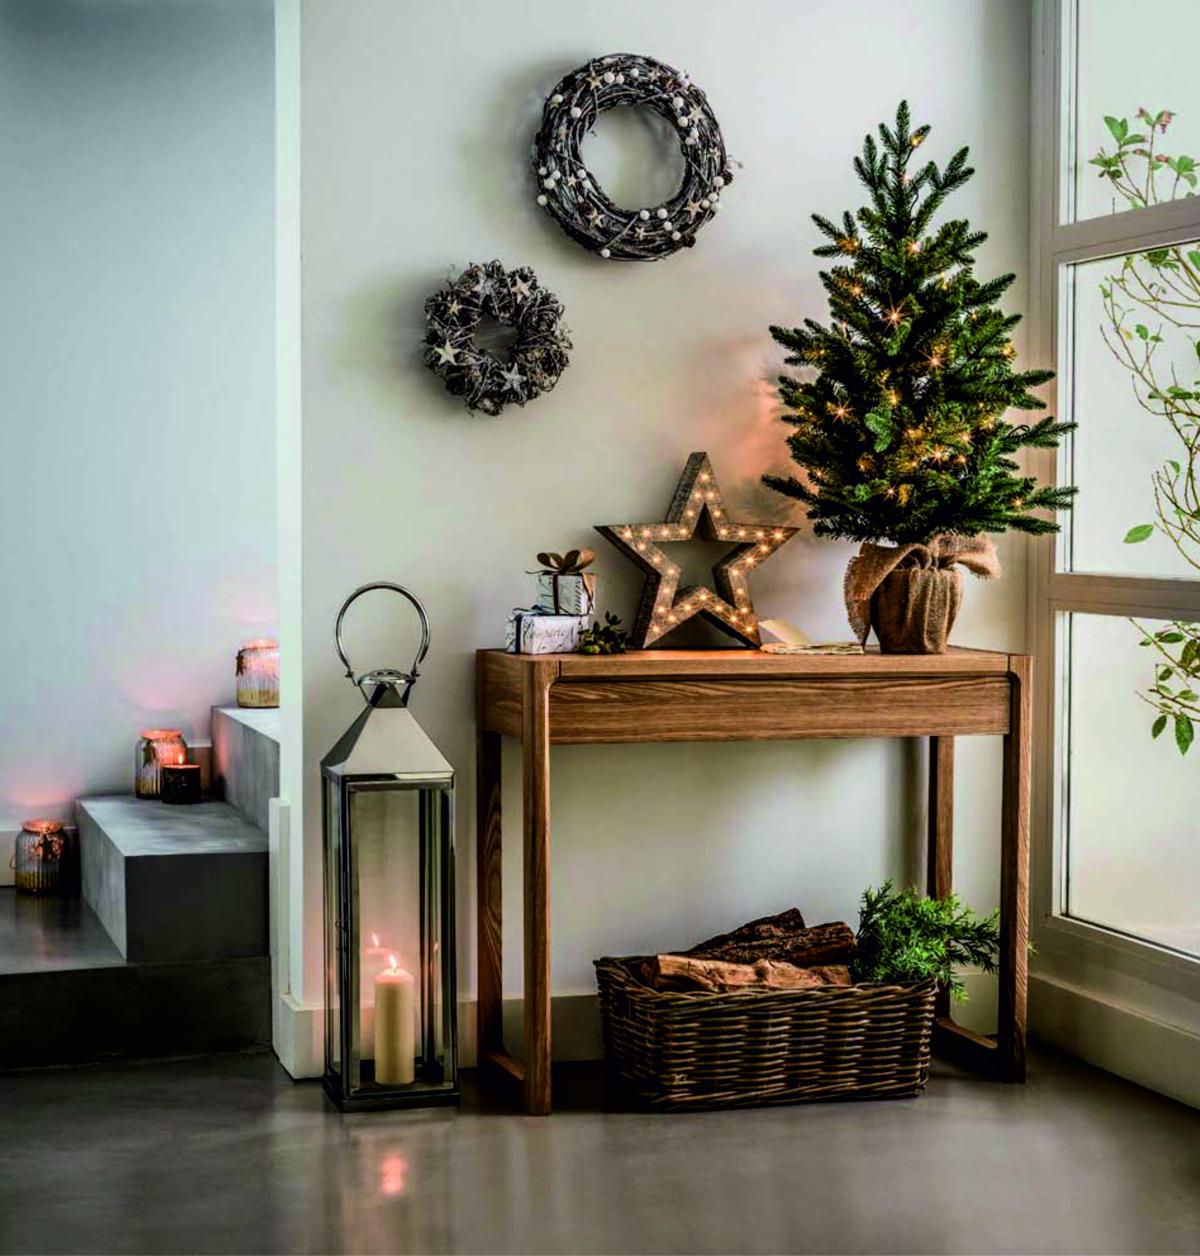 56f83cb8bc88 Catálogo de adornos de Navidad de El Corte Inglés 2016 - 2017